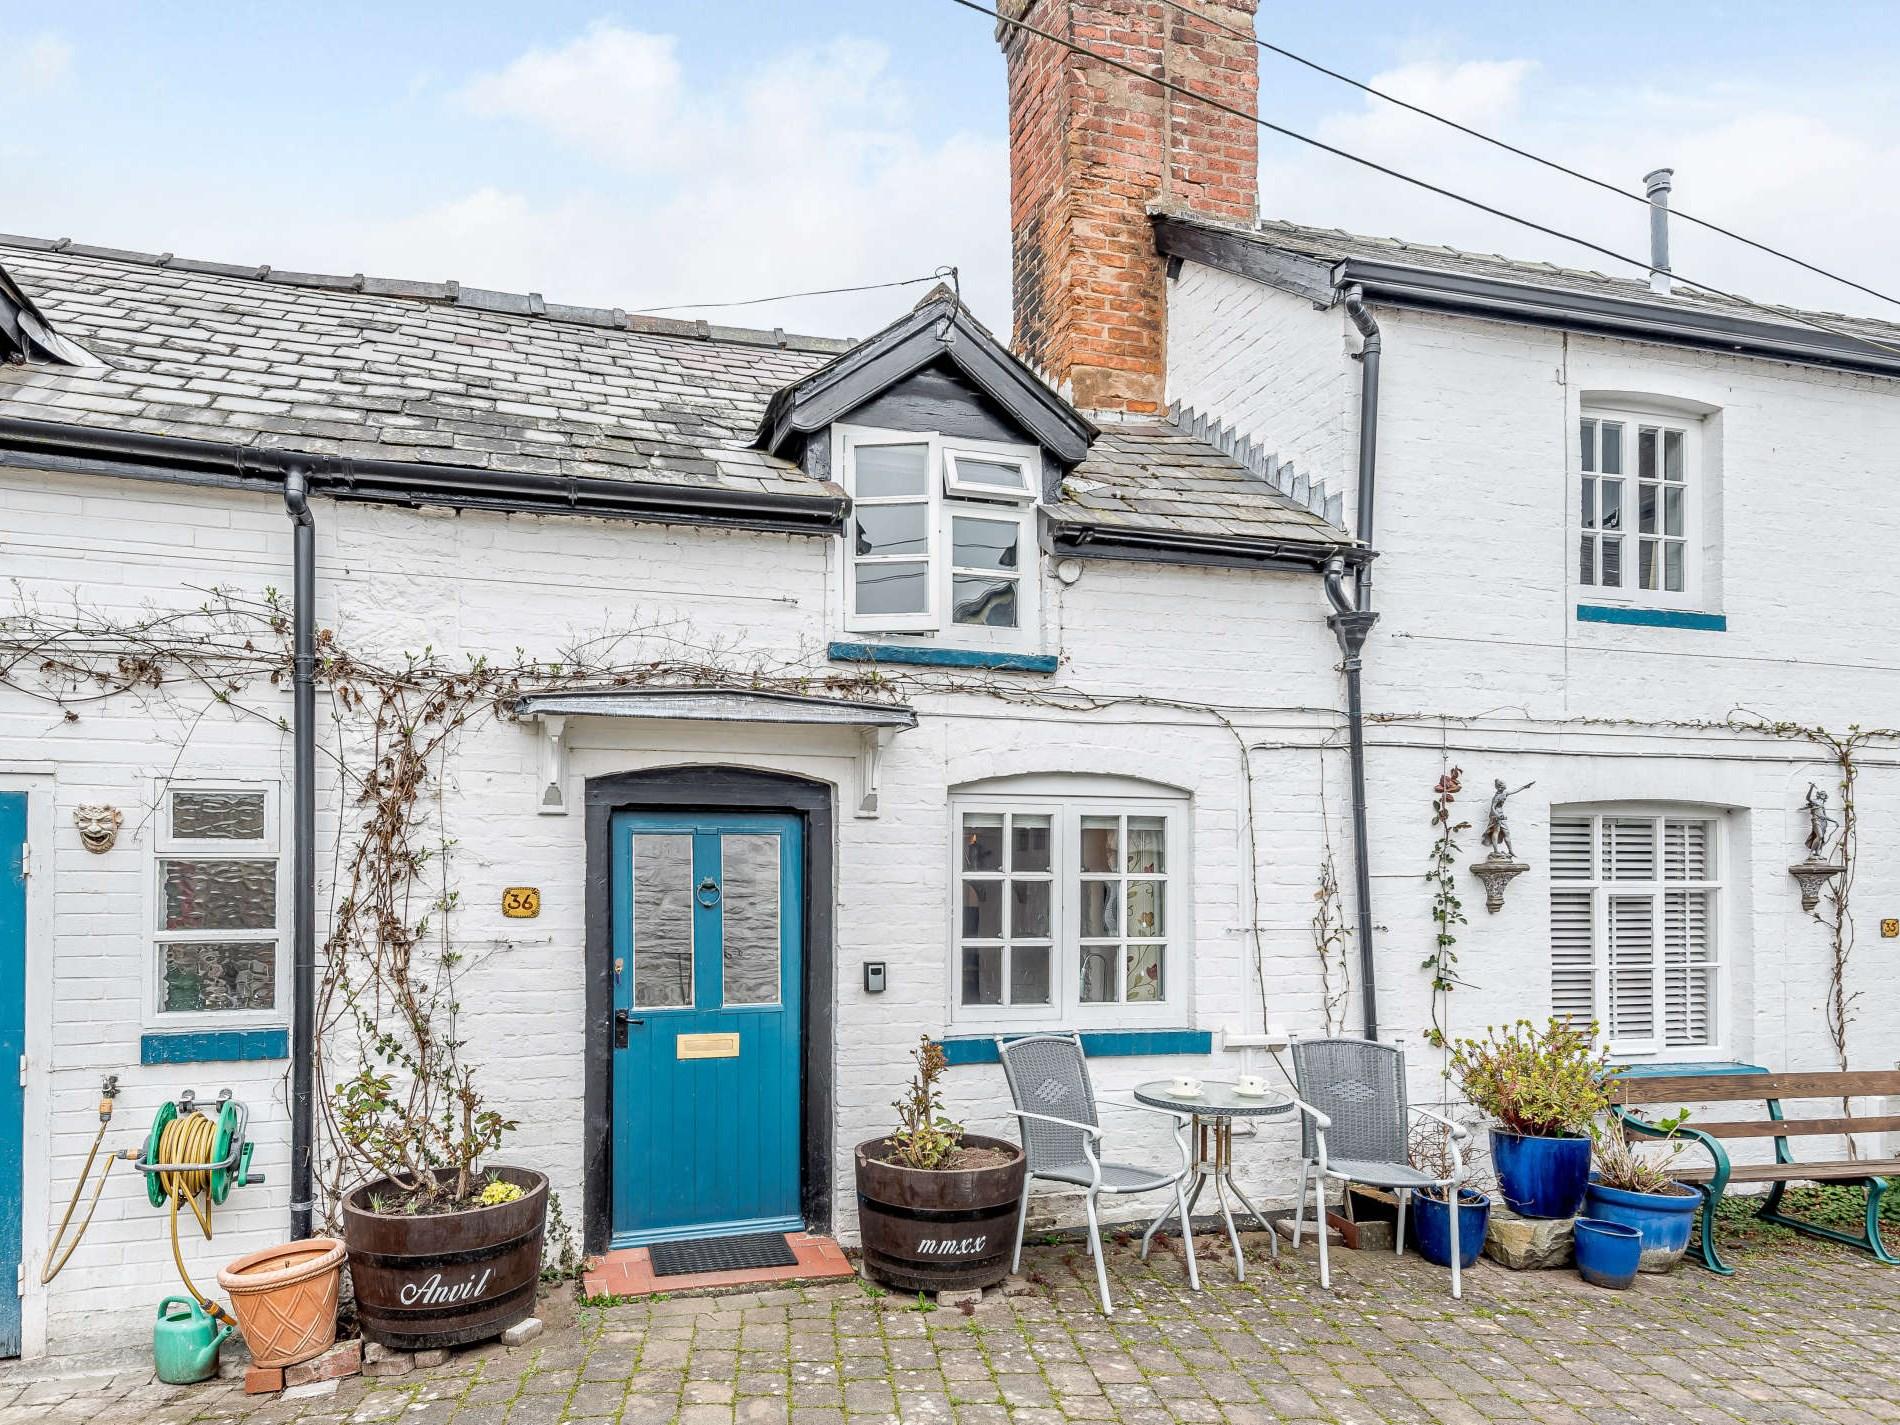 1 Bedroom Cottage in Presteigne, Mid Wales